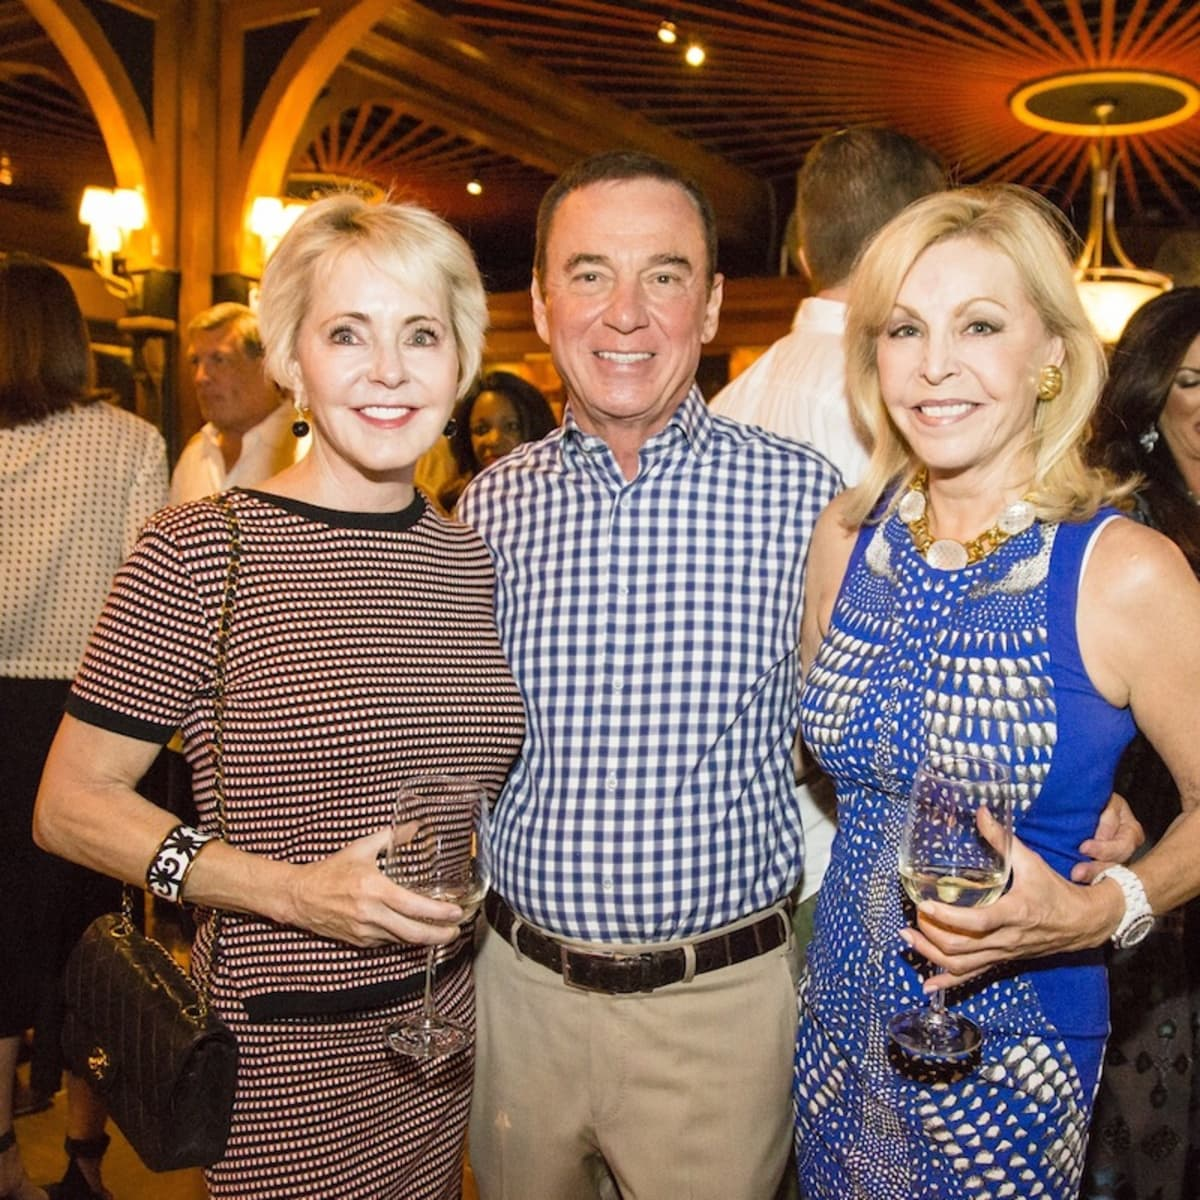 News, Shelby, Beth Muecke b'day, Oct. 2015 Karen Mayell, Mike Mayell, Susanne Dawley